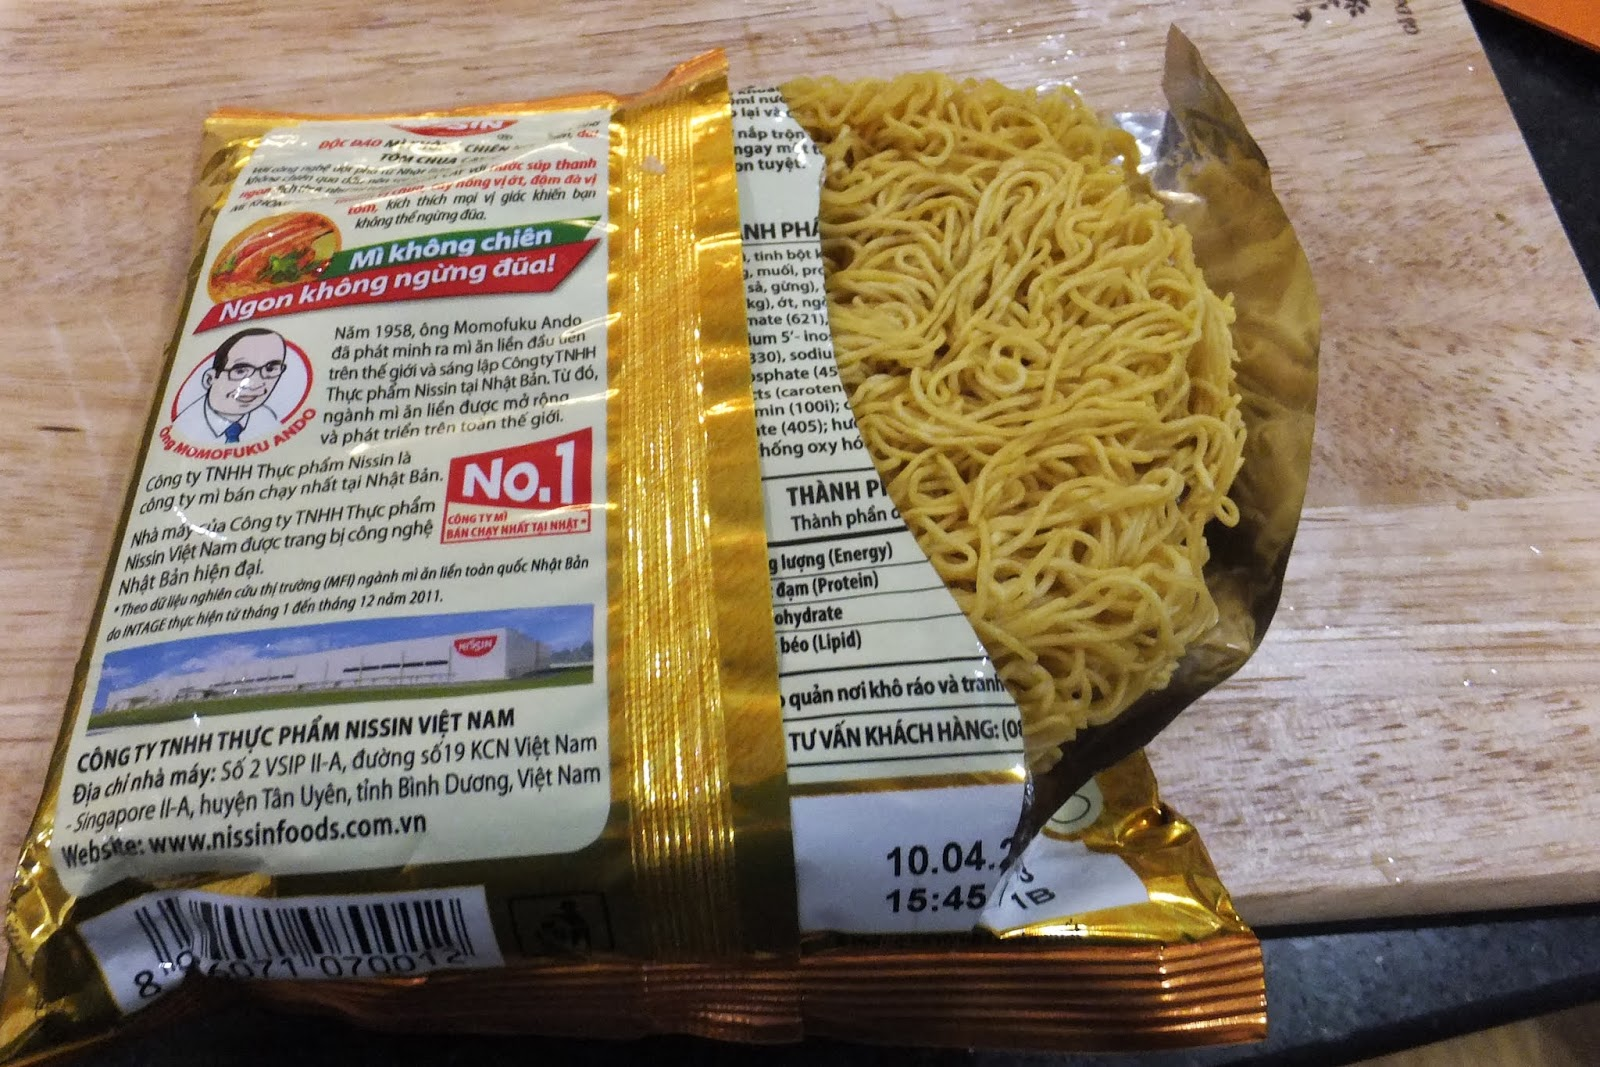 nissin-noodle-vietnam ベトナム日清の即席めん2